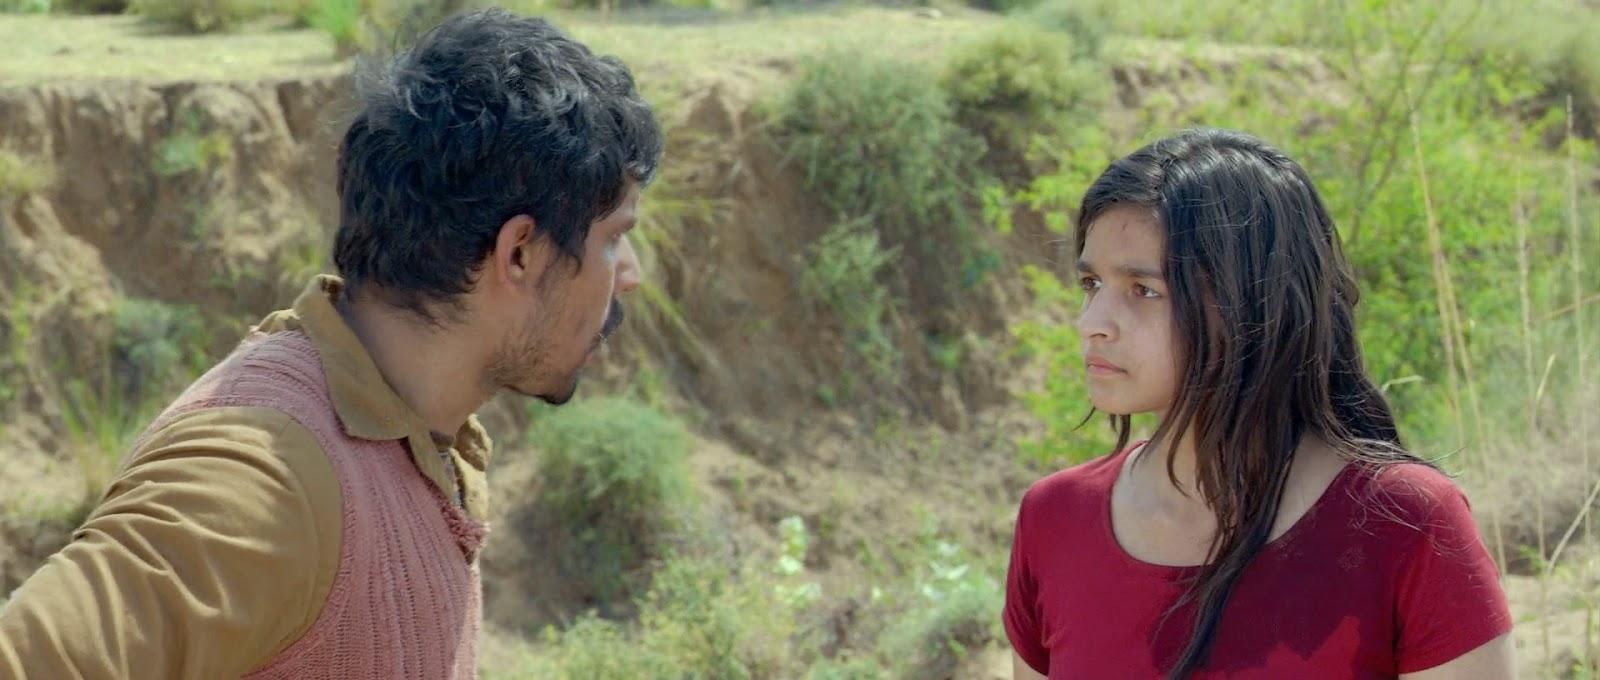 Tag Highway Hindi Full Movie With English Subtitles Waldon Protese